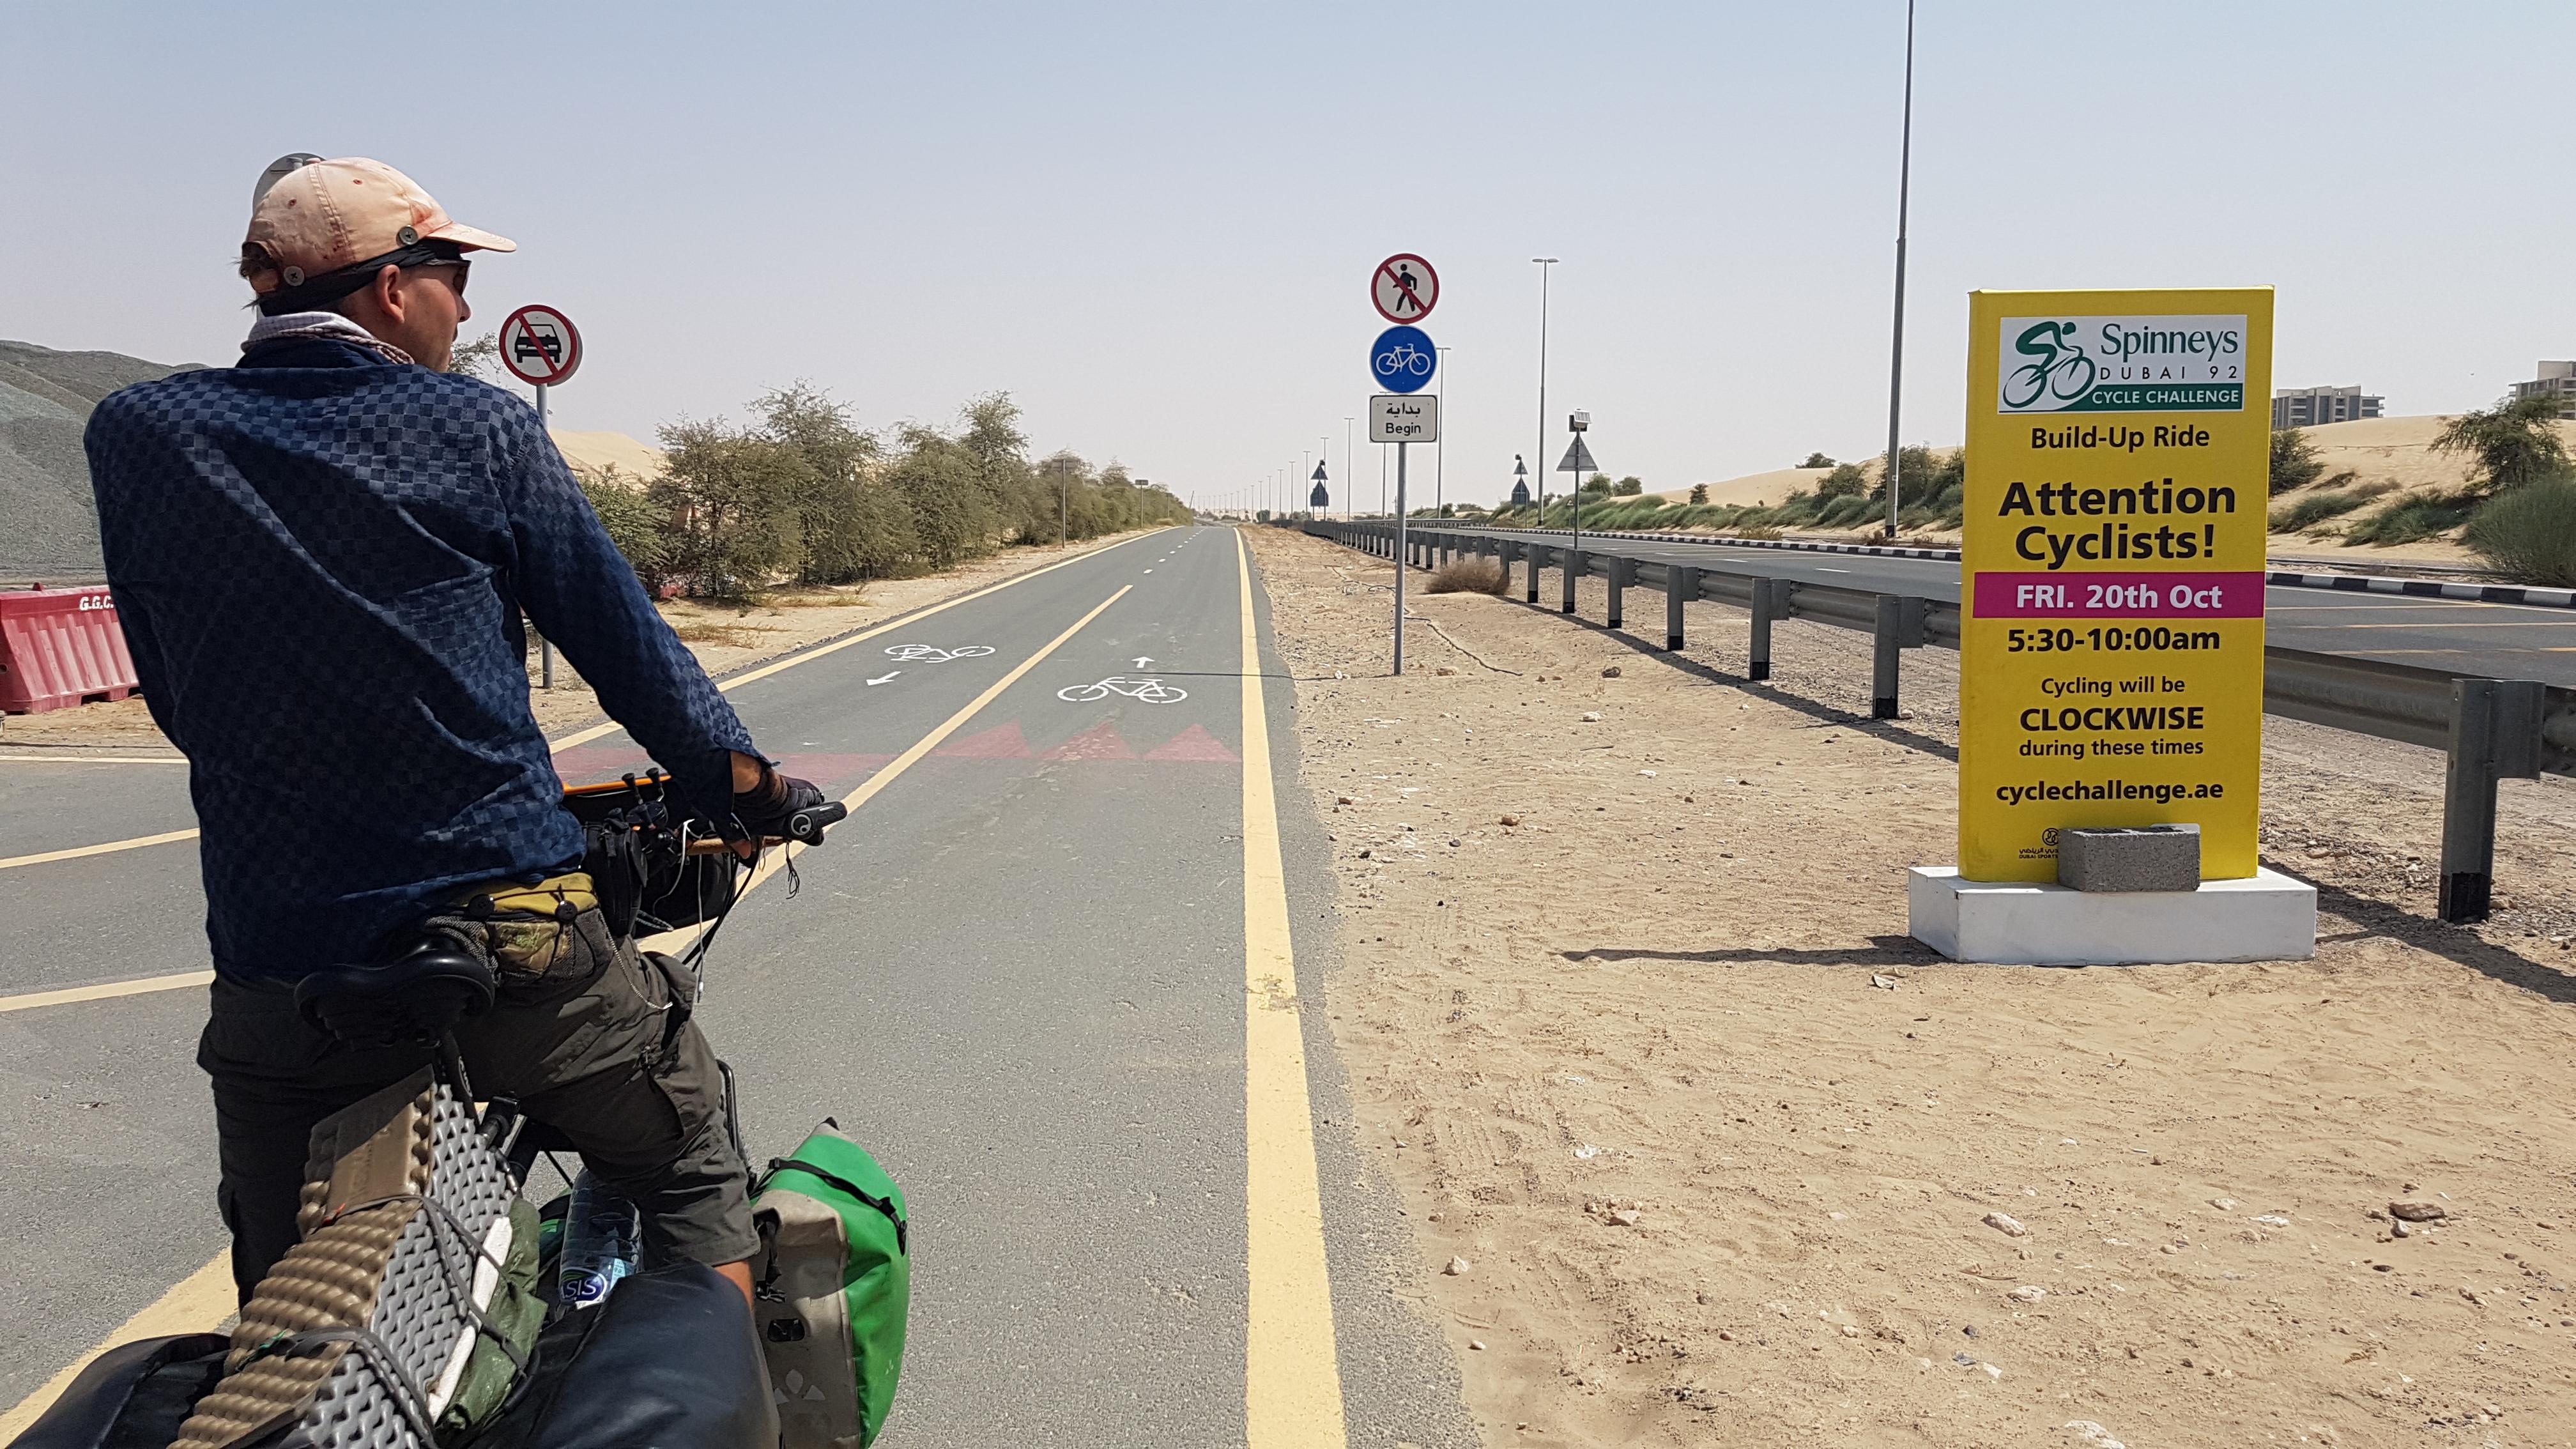 Cycling at Al Qudra